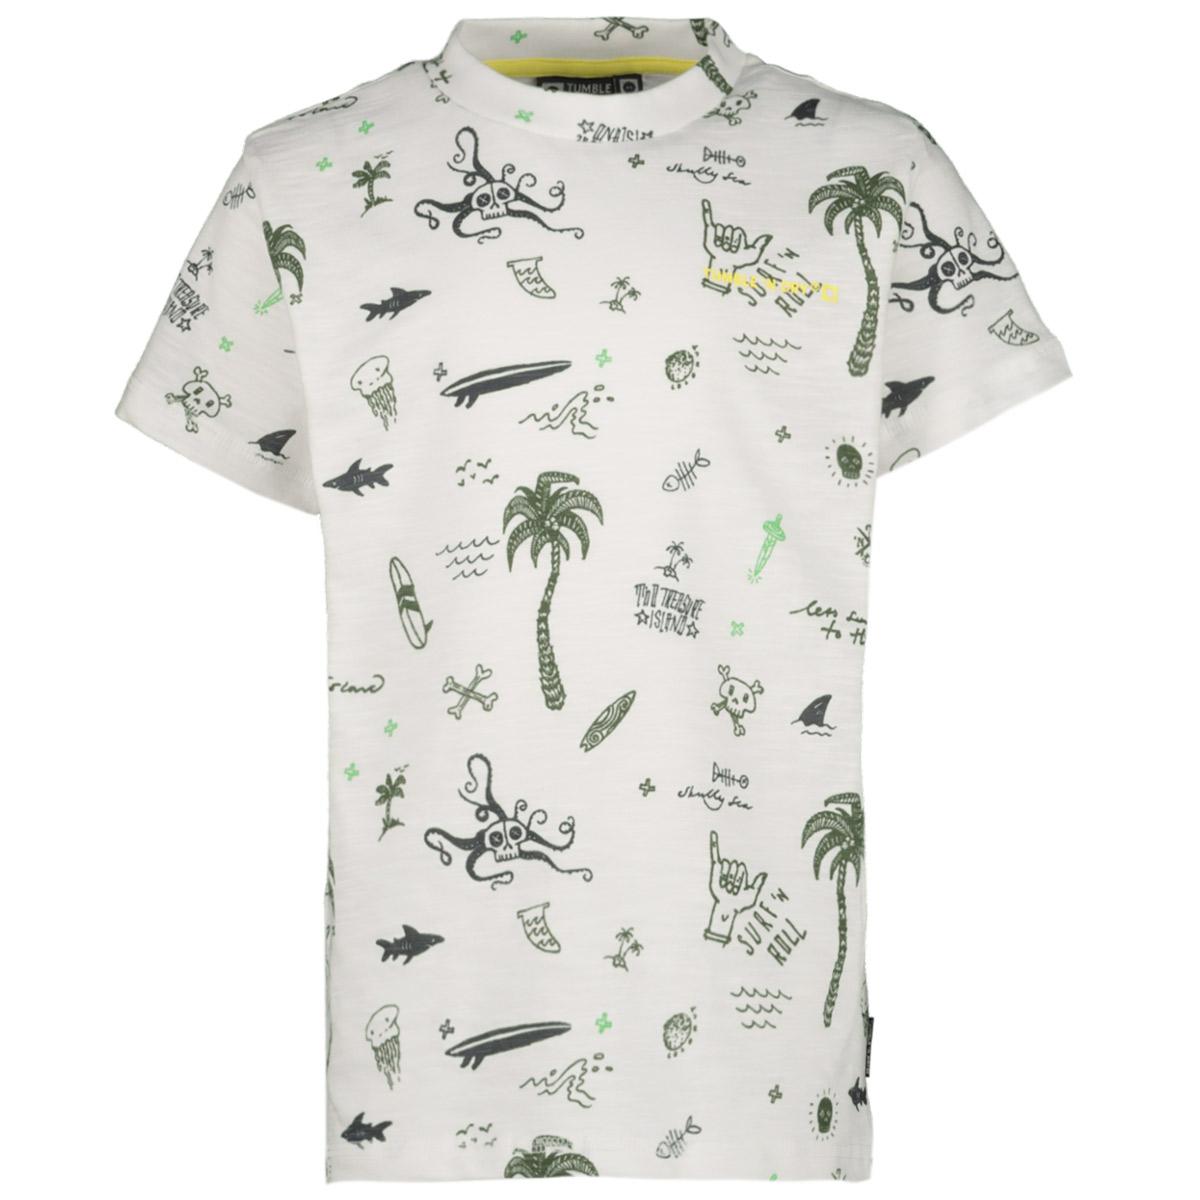 fbbcea83bdd Tumble 'N Dry T-shirt wit - kleertjes.com